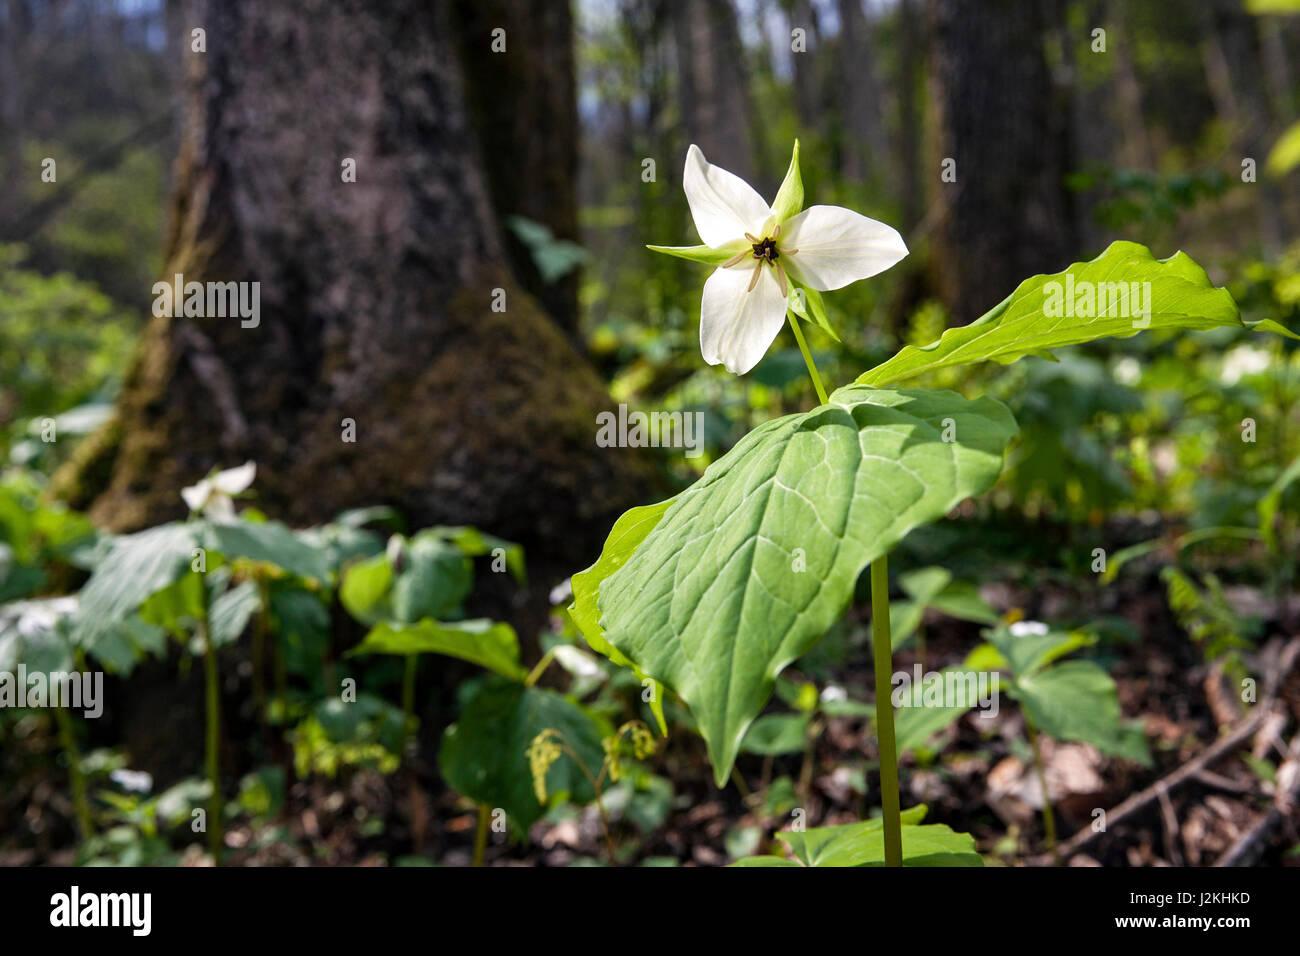 White Trillium (Shallow DOF) - Holmes Educational State Forest, Hendersonville, North Carolina, USA - Stock Image